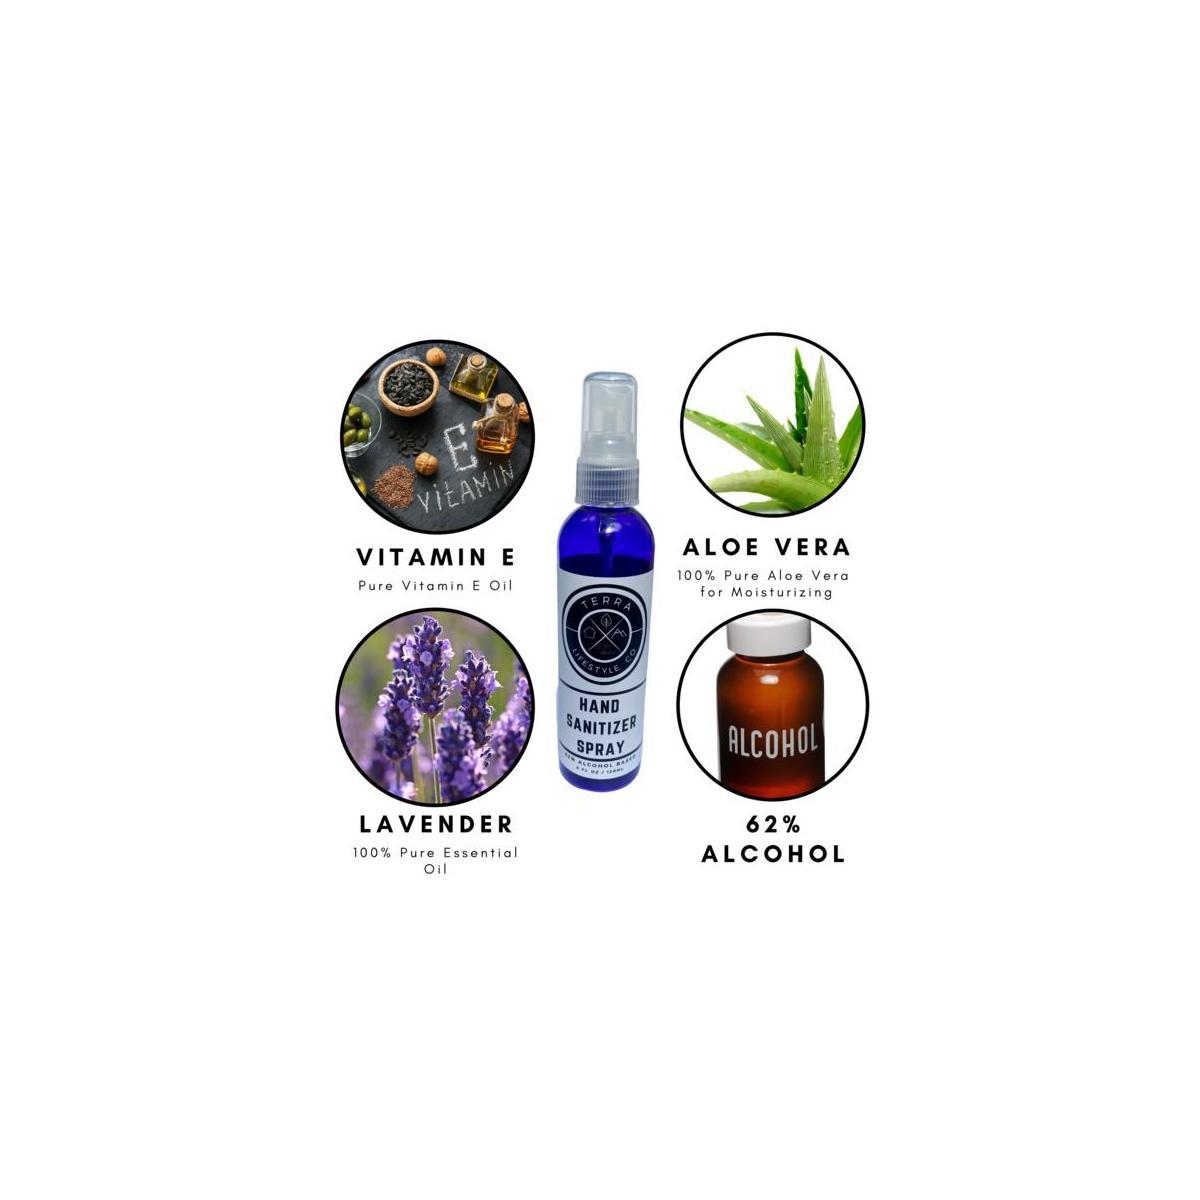 All Natural Hand Sanitizer Spray With Aloe Vera, Vitamin E,